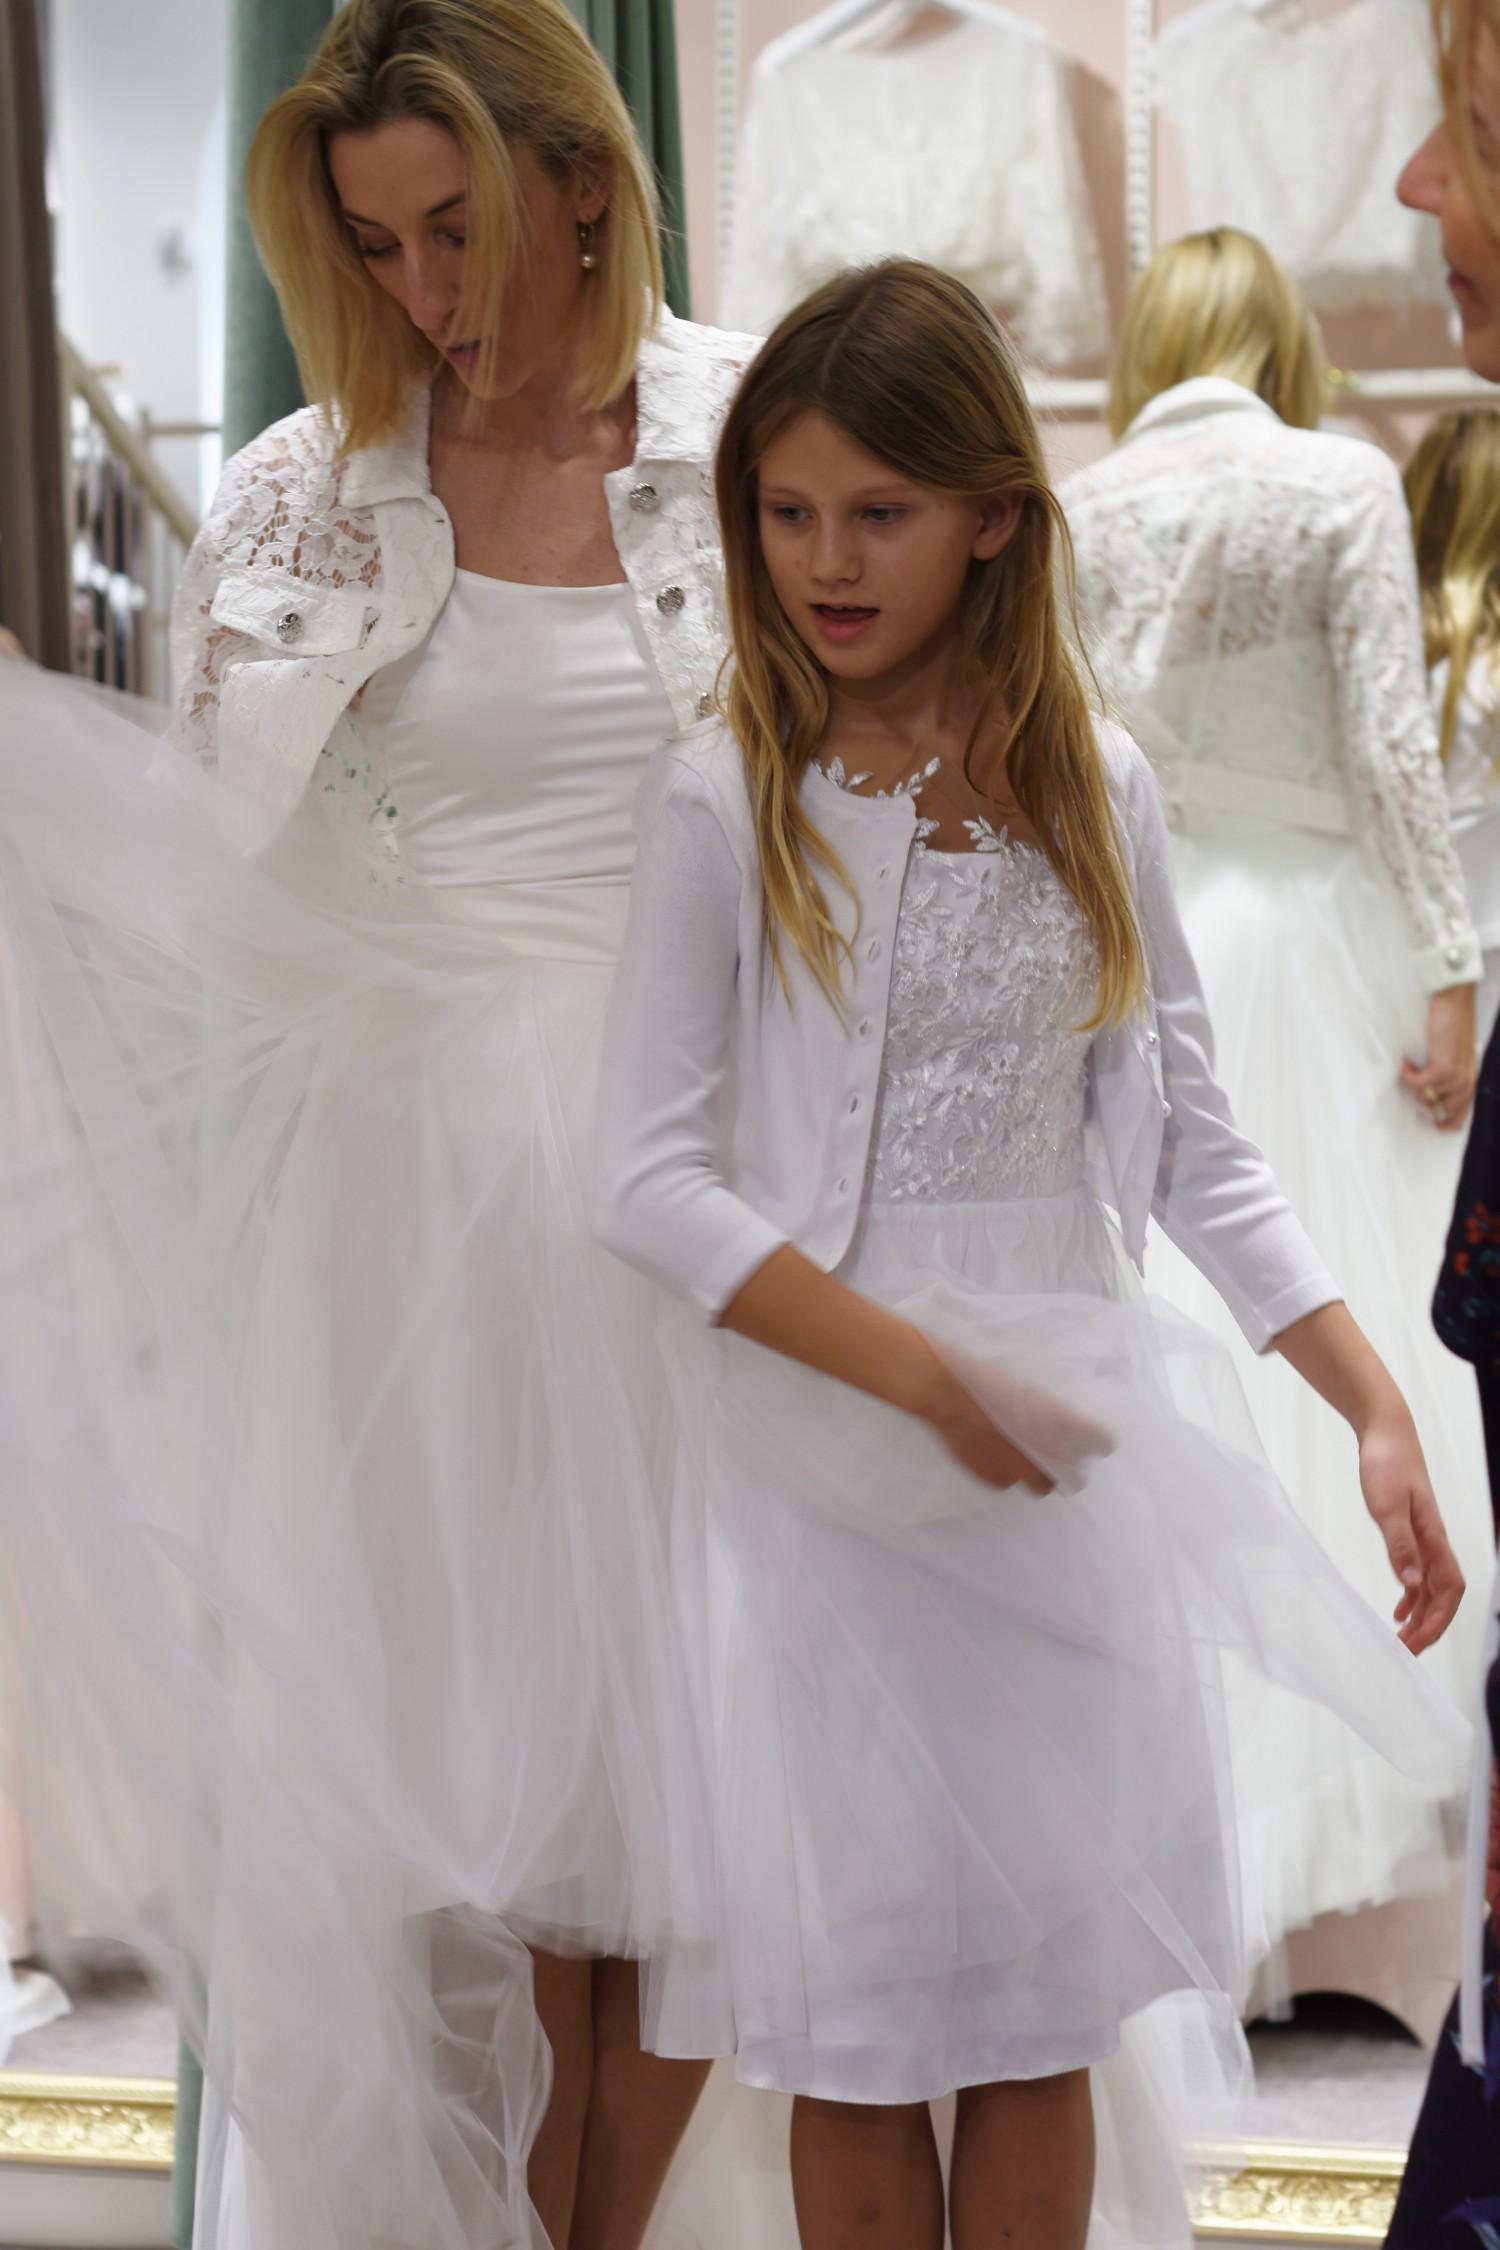 lilly-brudekjoler-annemette-voss-64